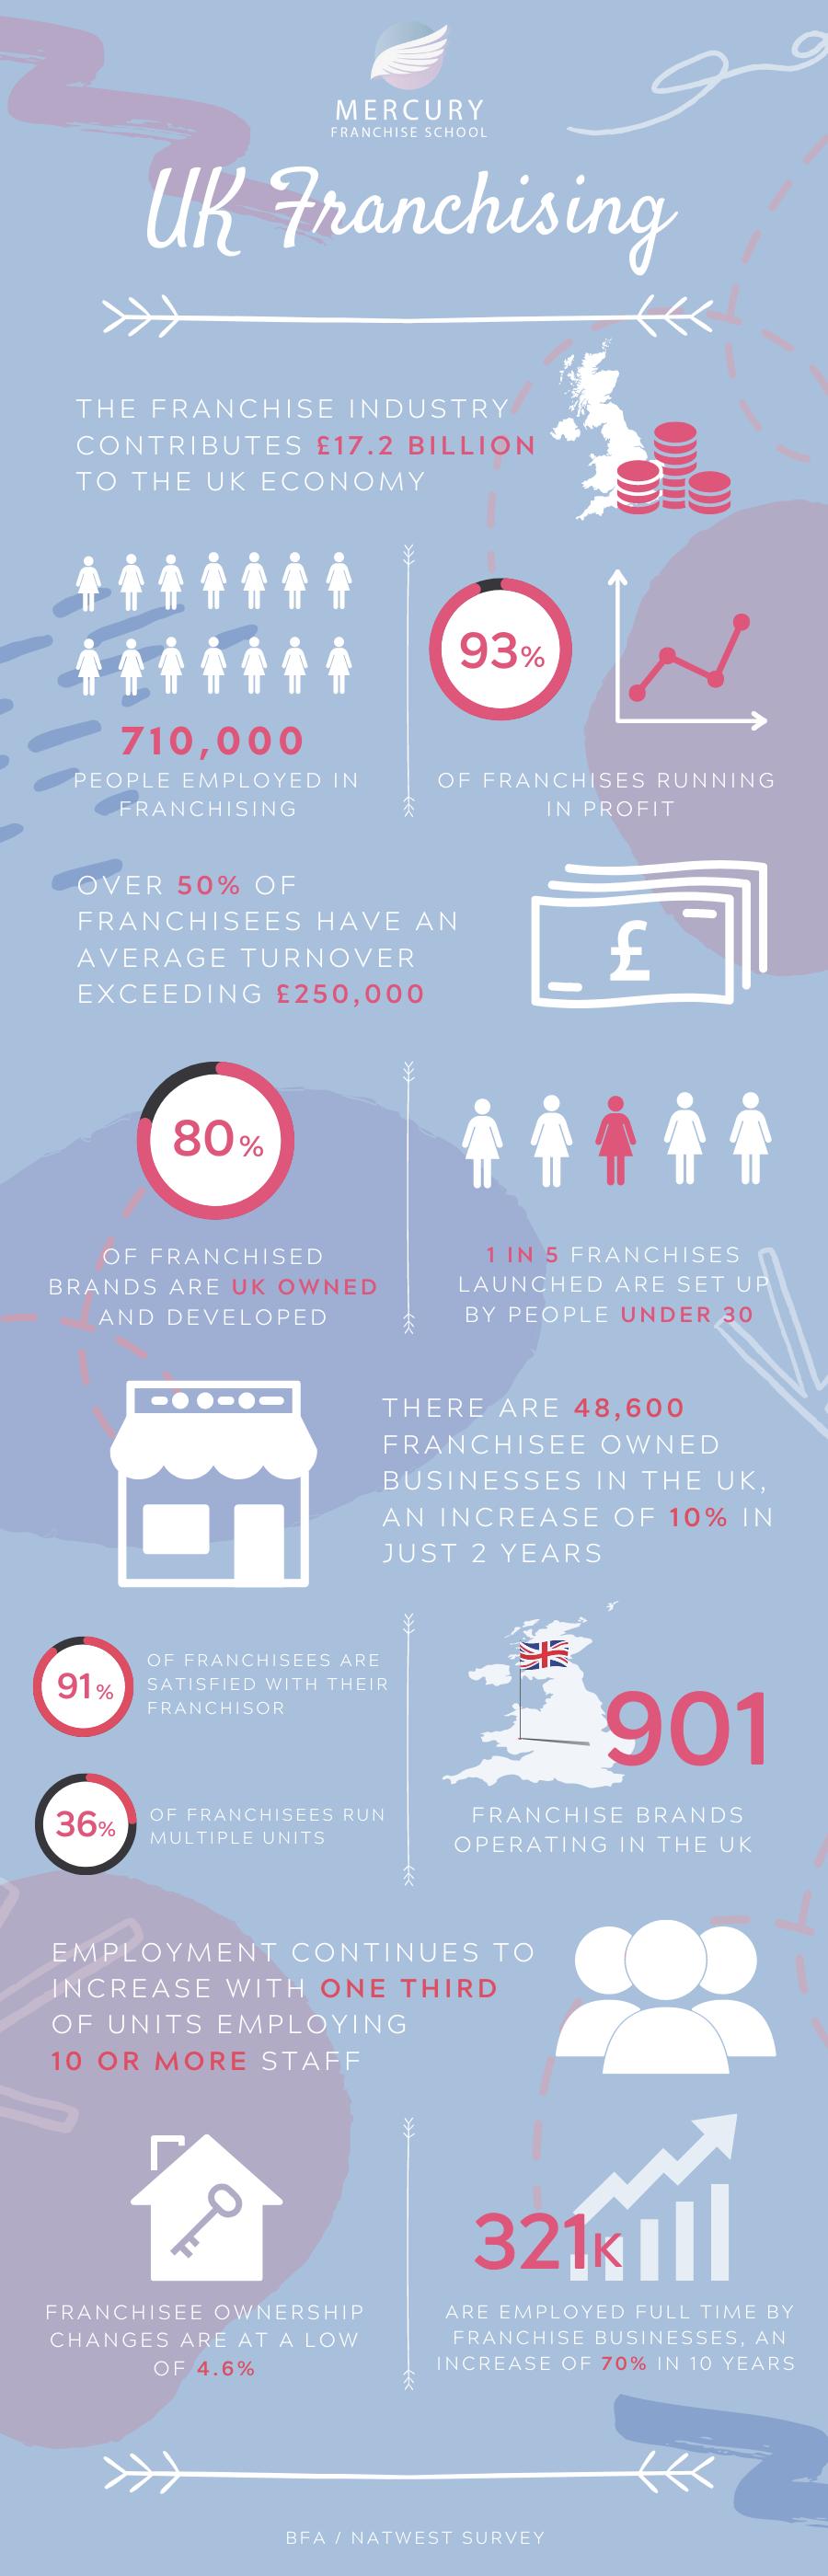 franchise statistics infographic